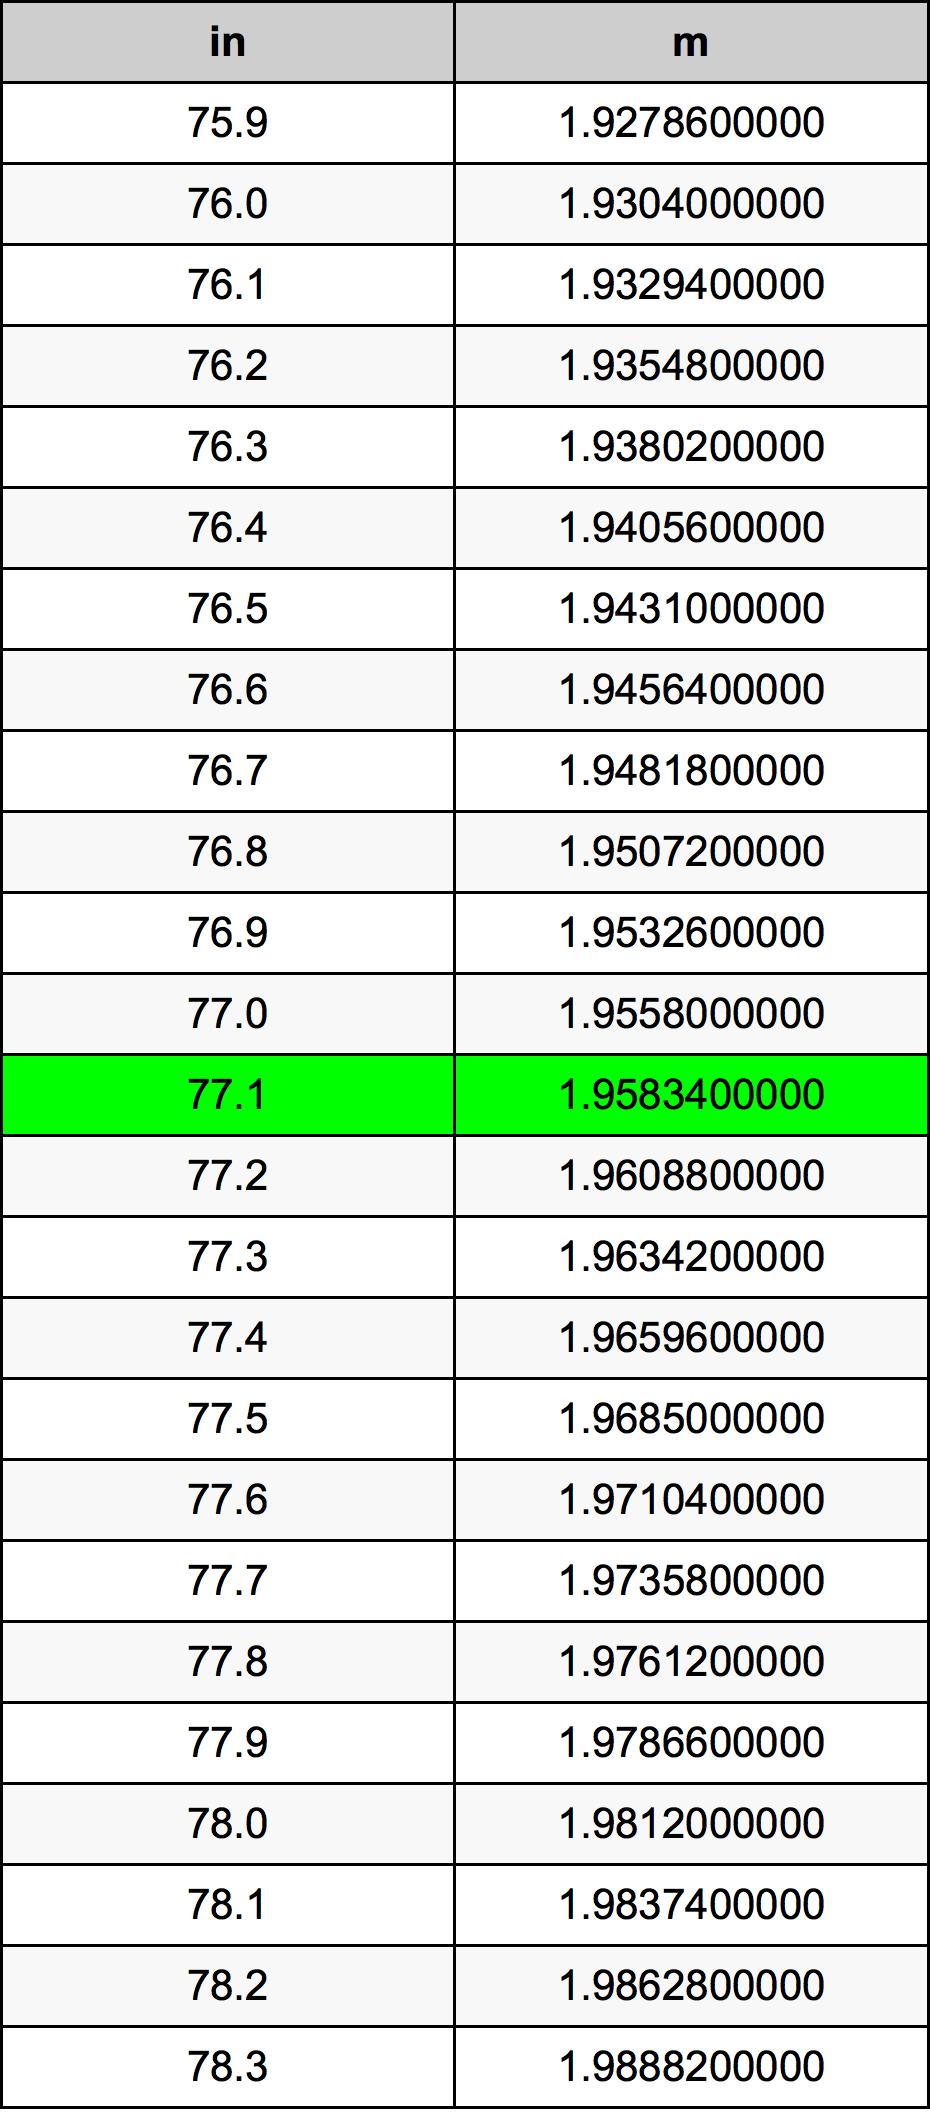 77.1 дюйм Таблица преобразования